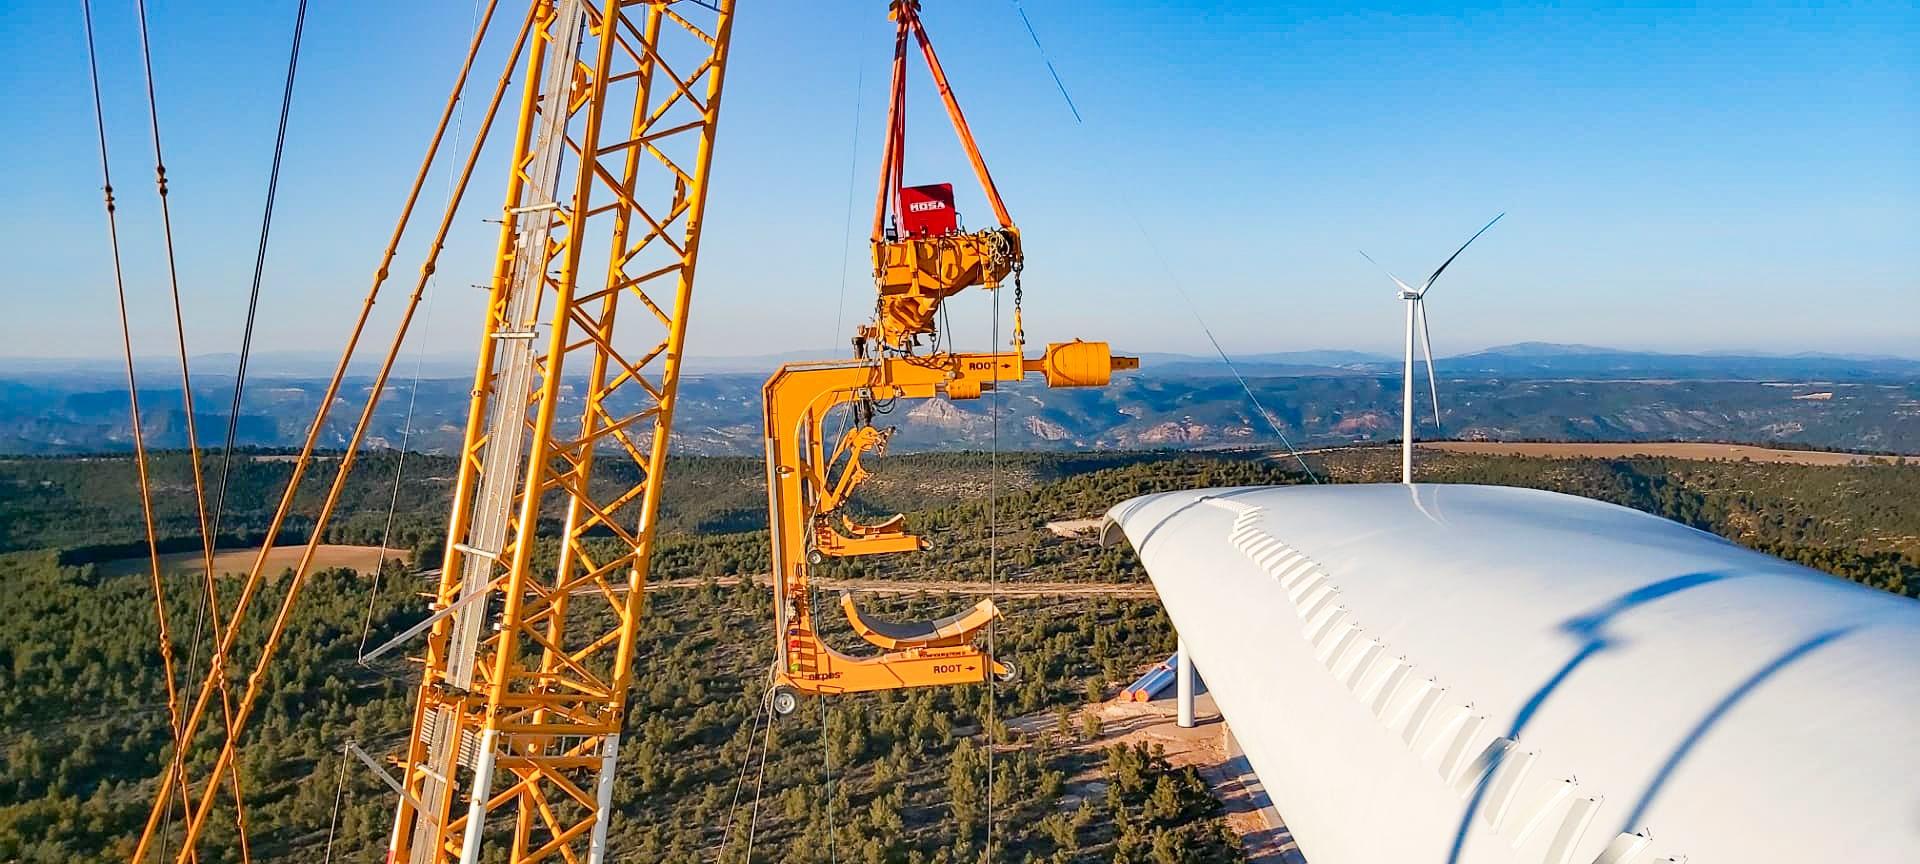 Cofrentes Wind Farm 3